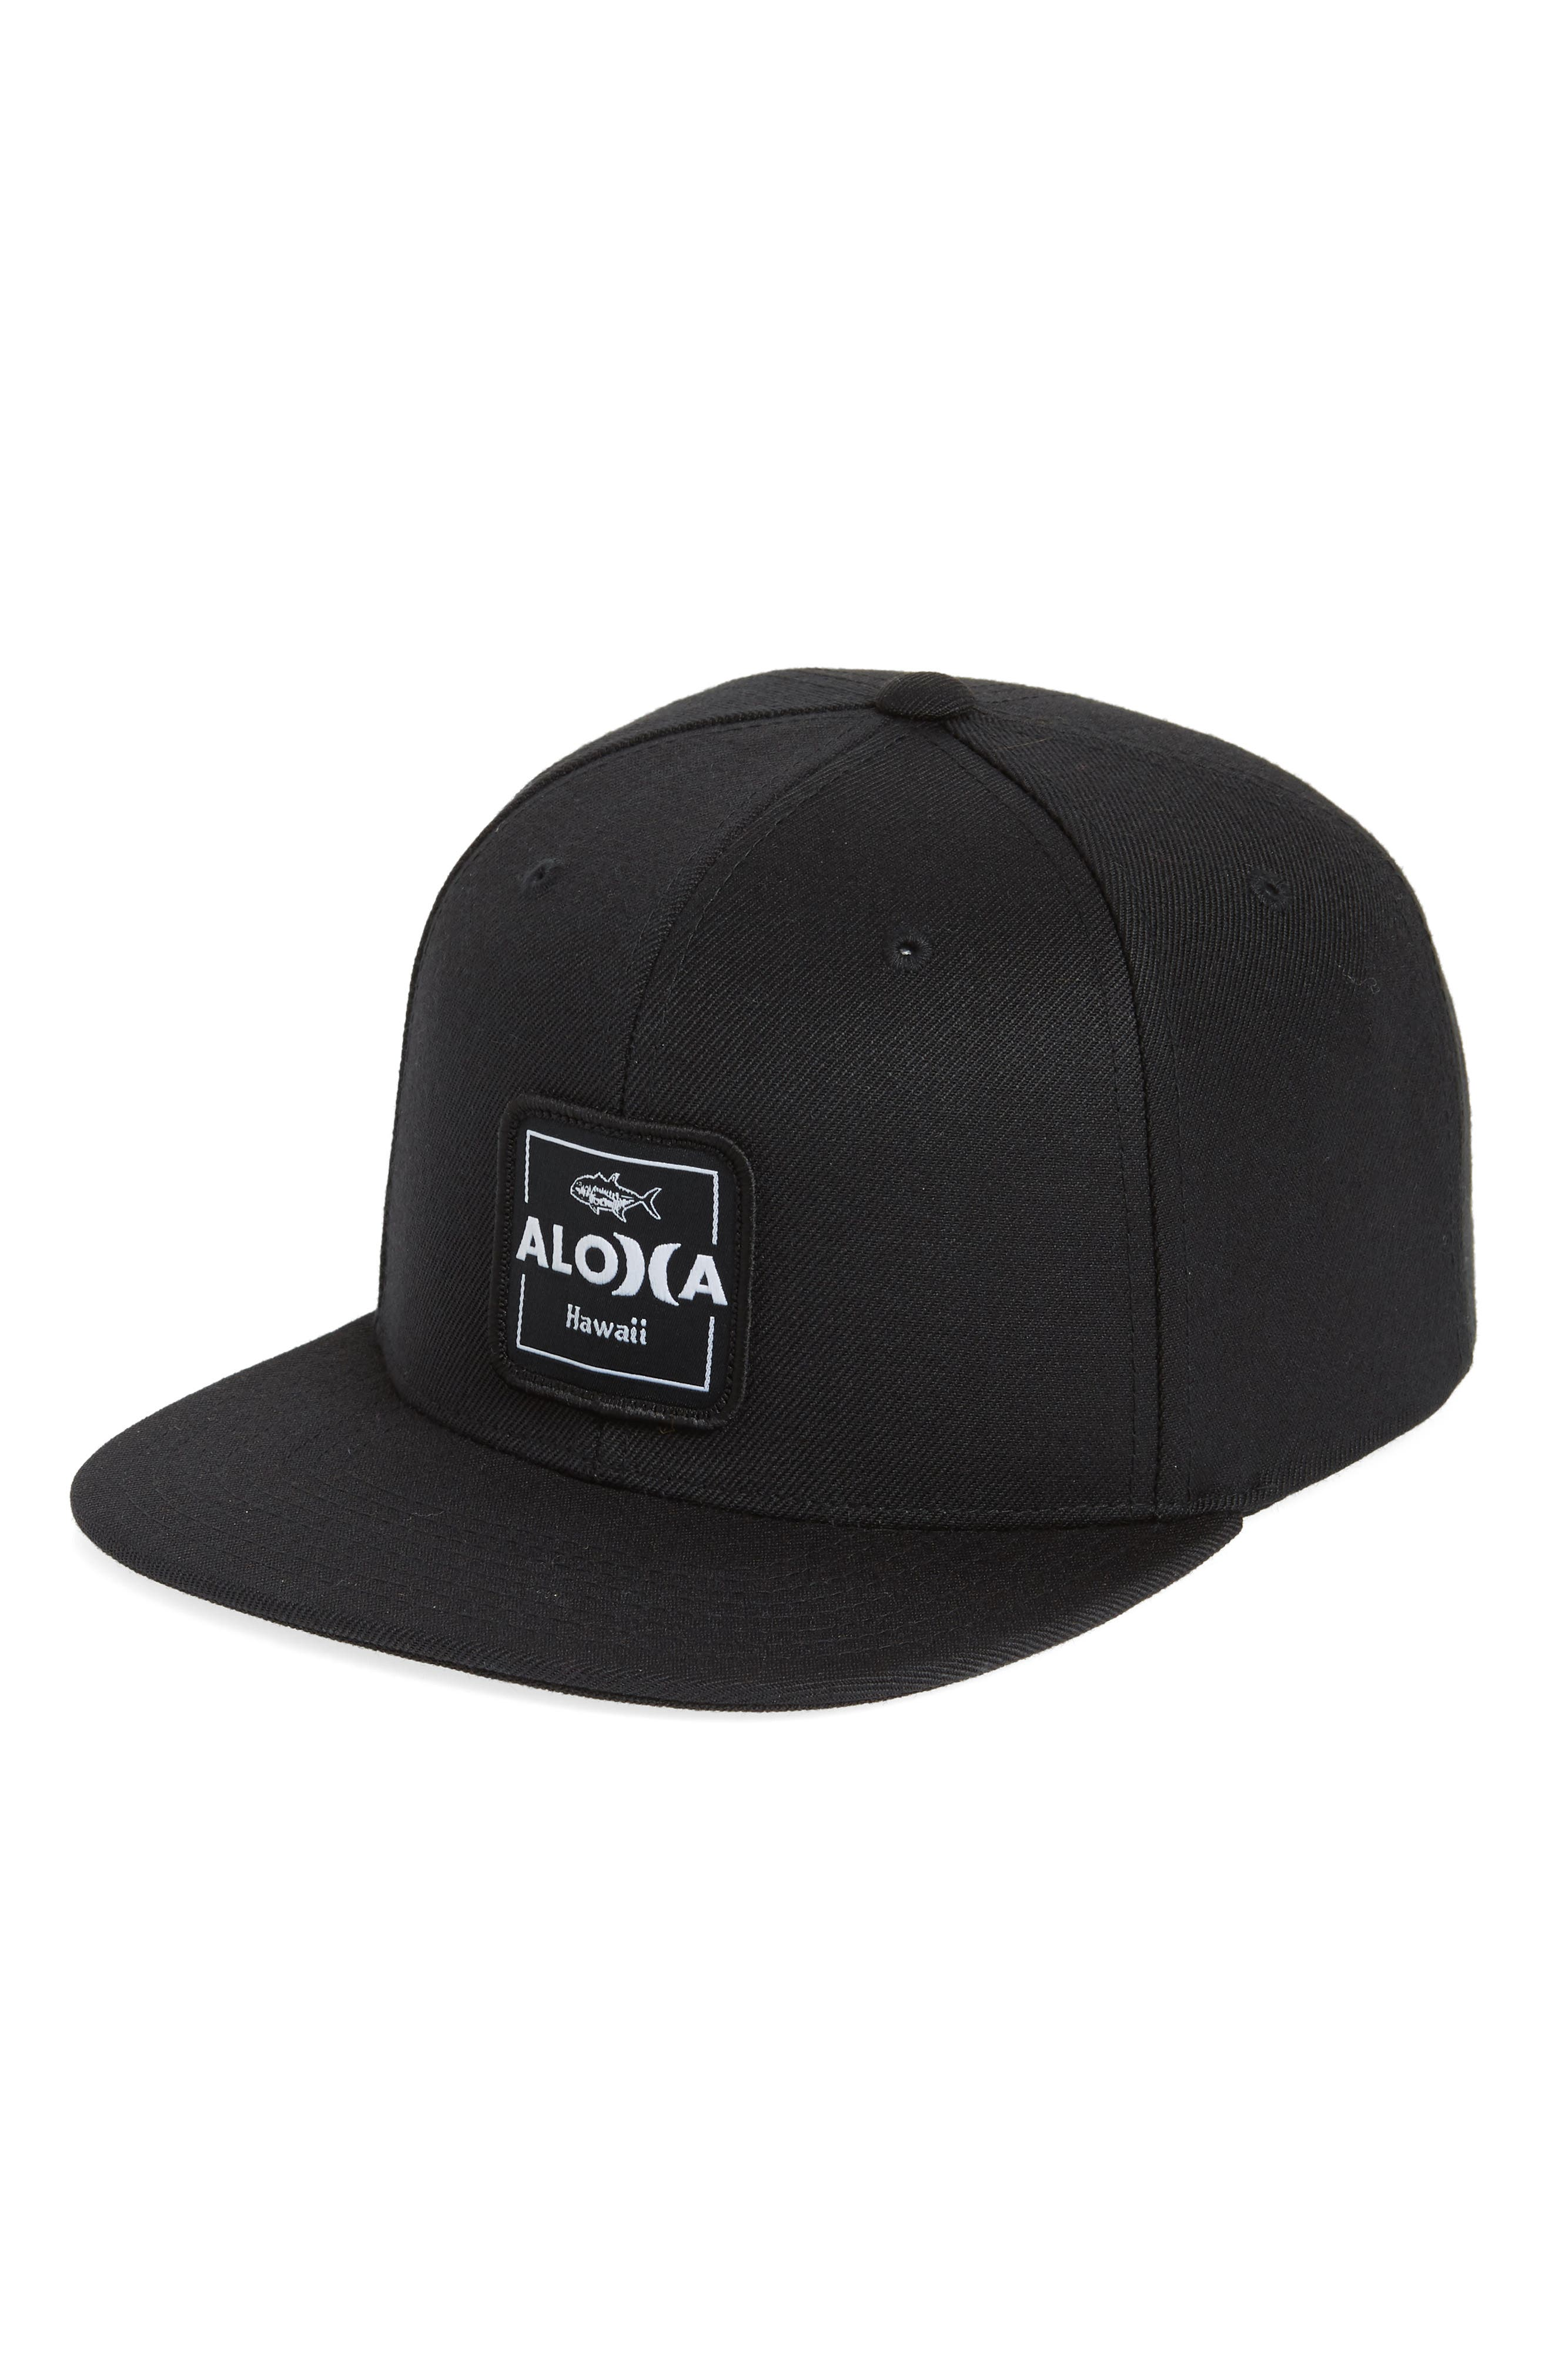 Hurley Aloha Cruiser 2 Cap